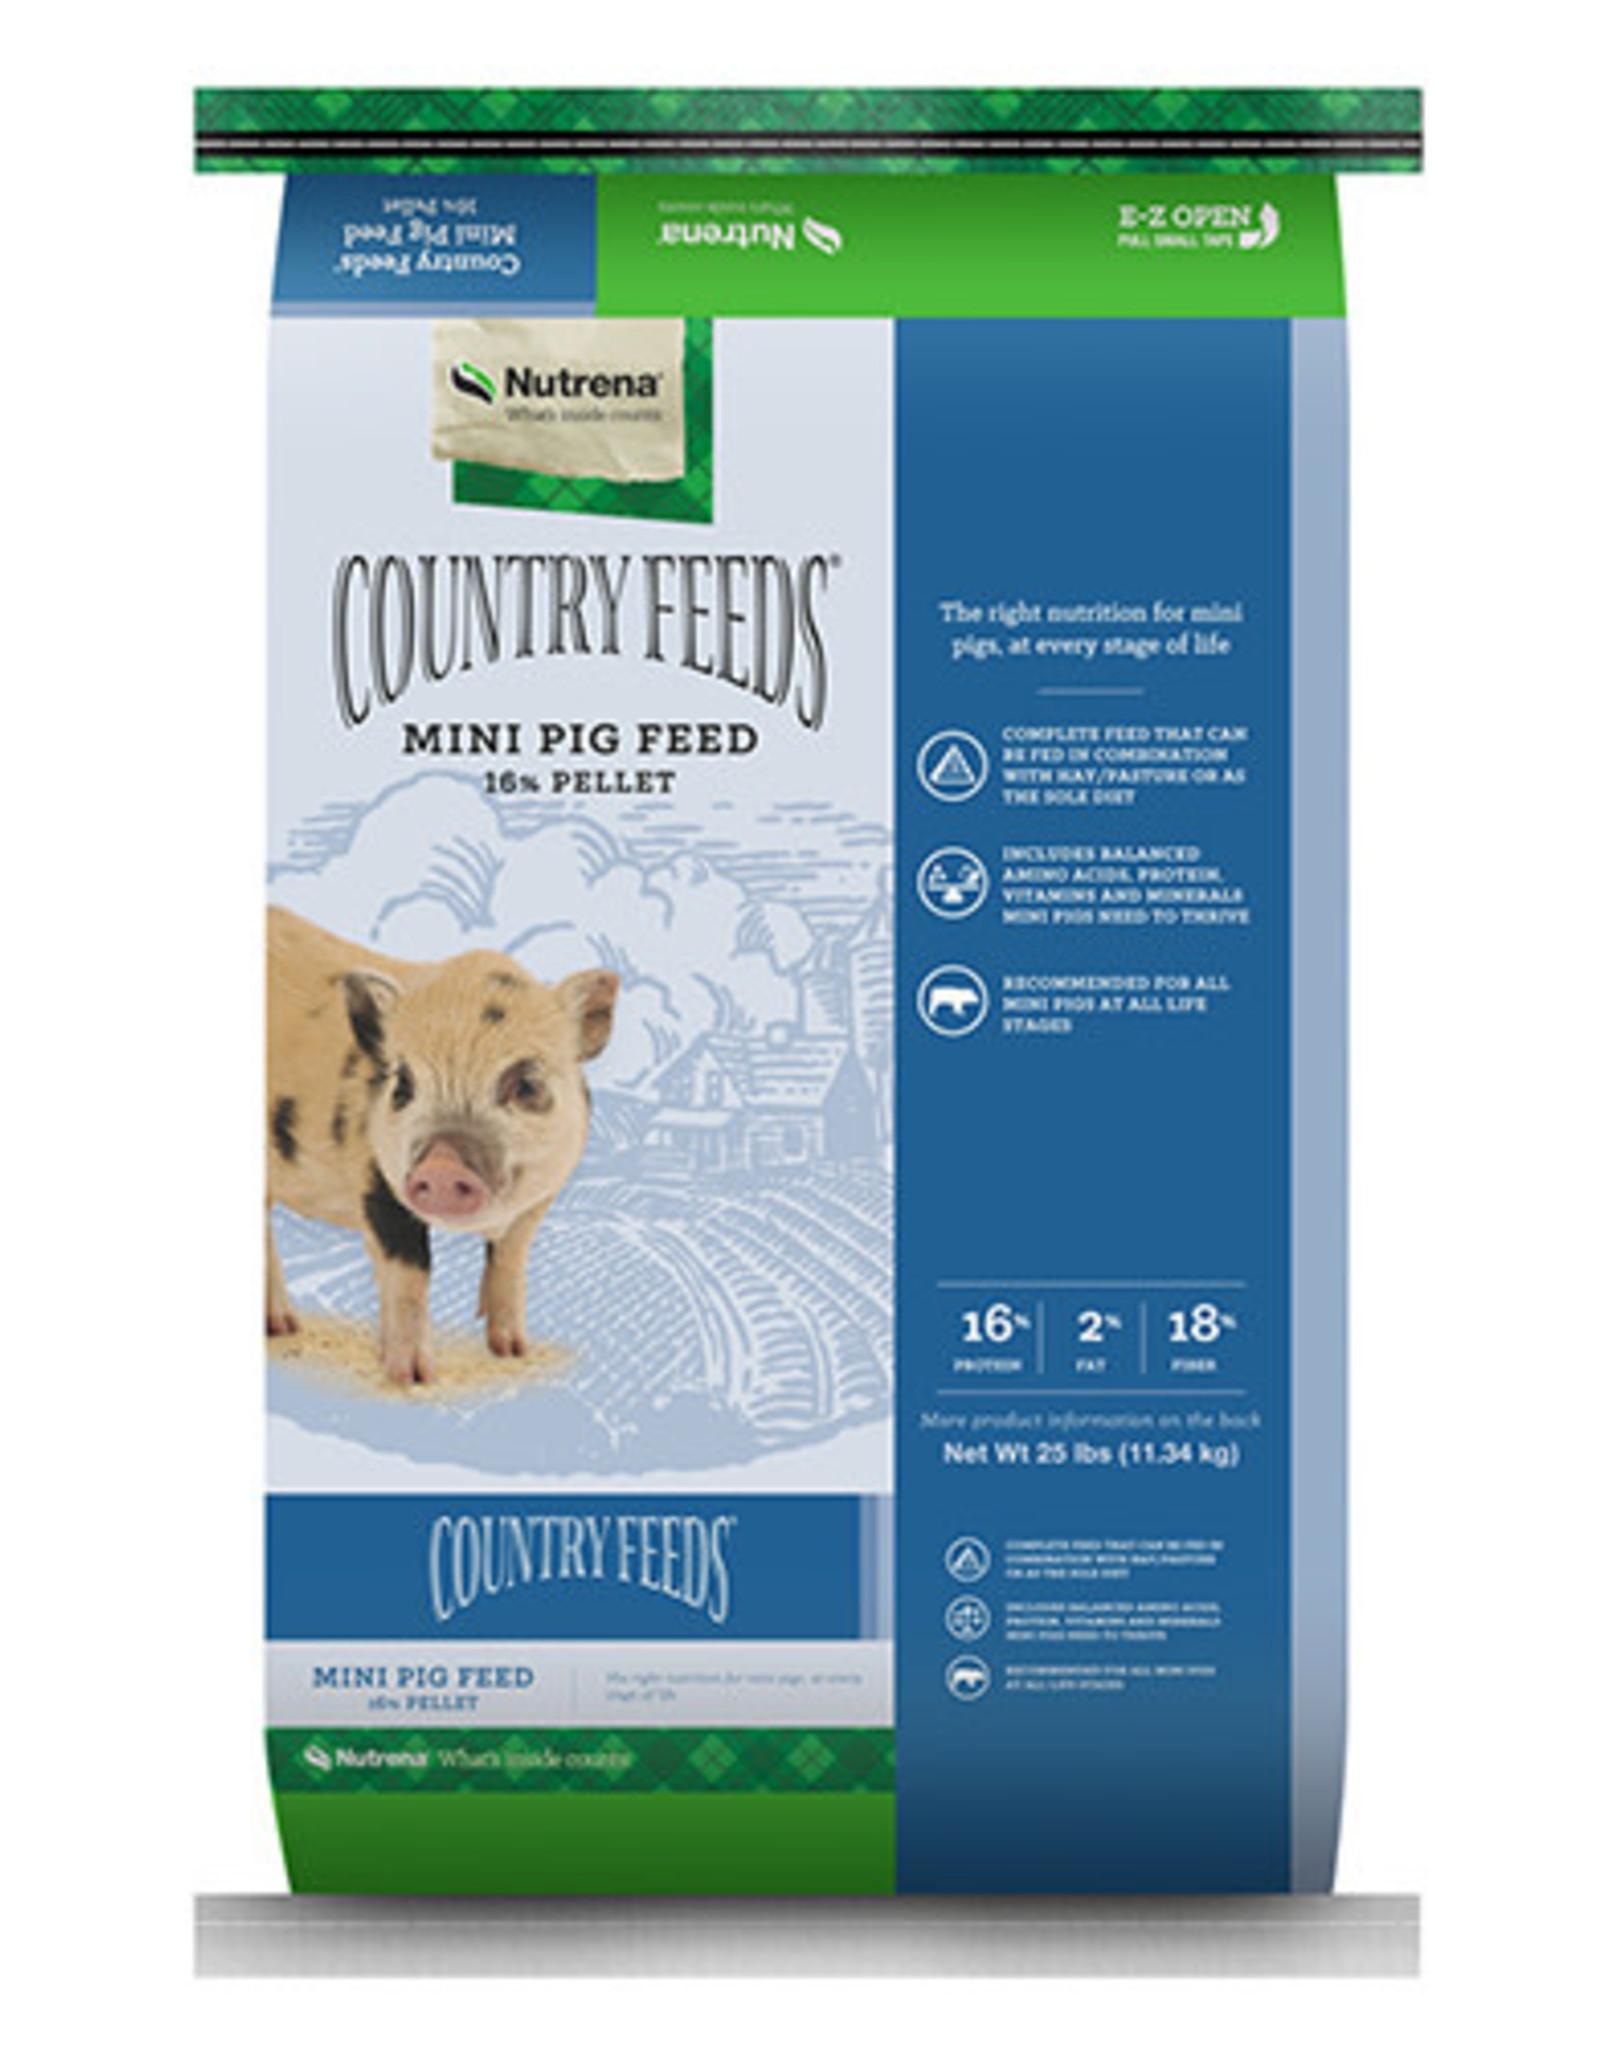 Country Feeds CF Mini Pig 16% Pellet 25lb